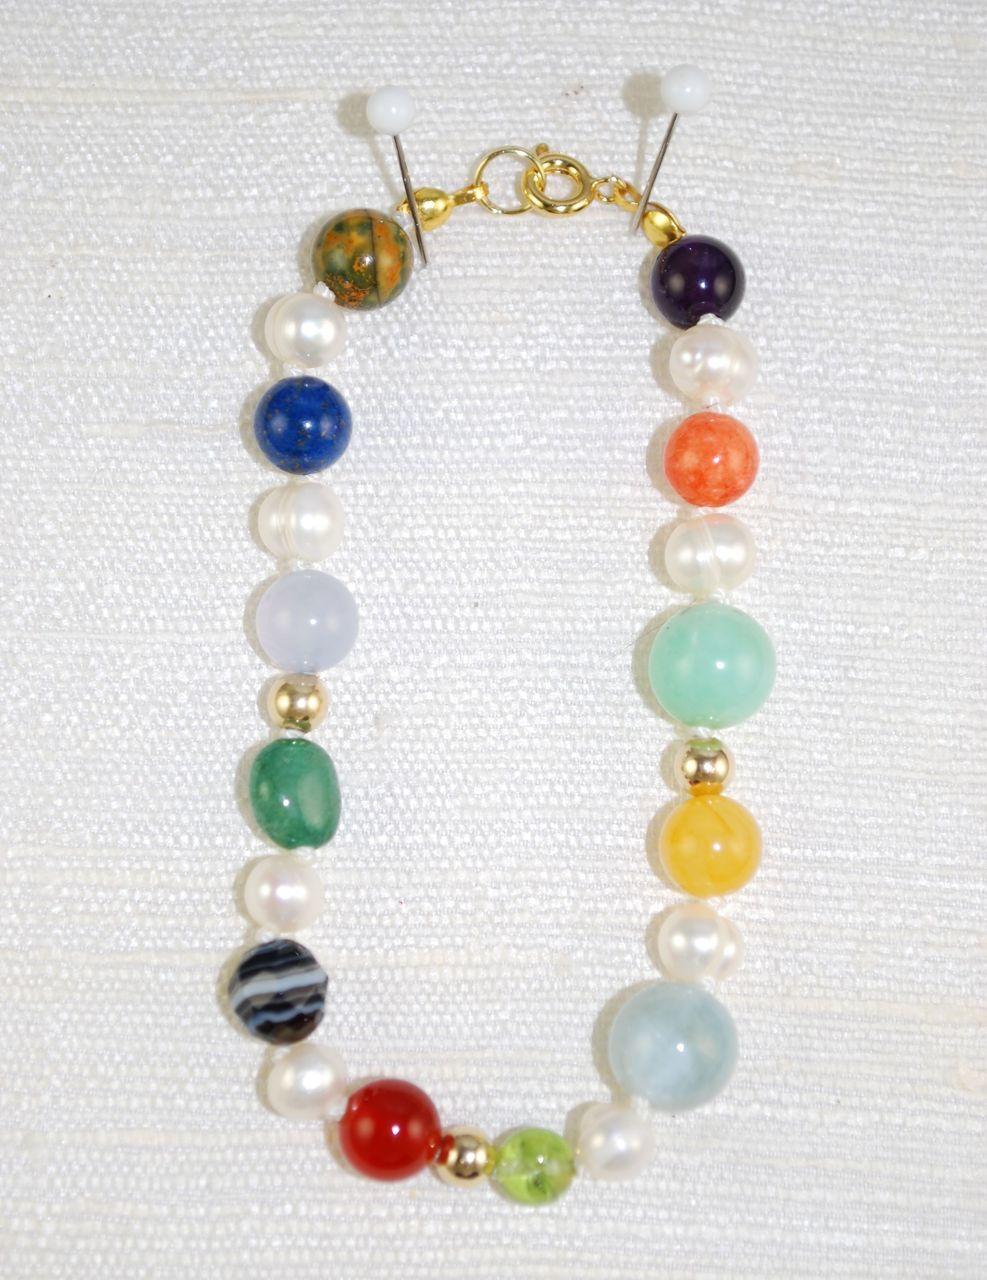 Enchanting Jewelry Creations image 32